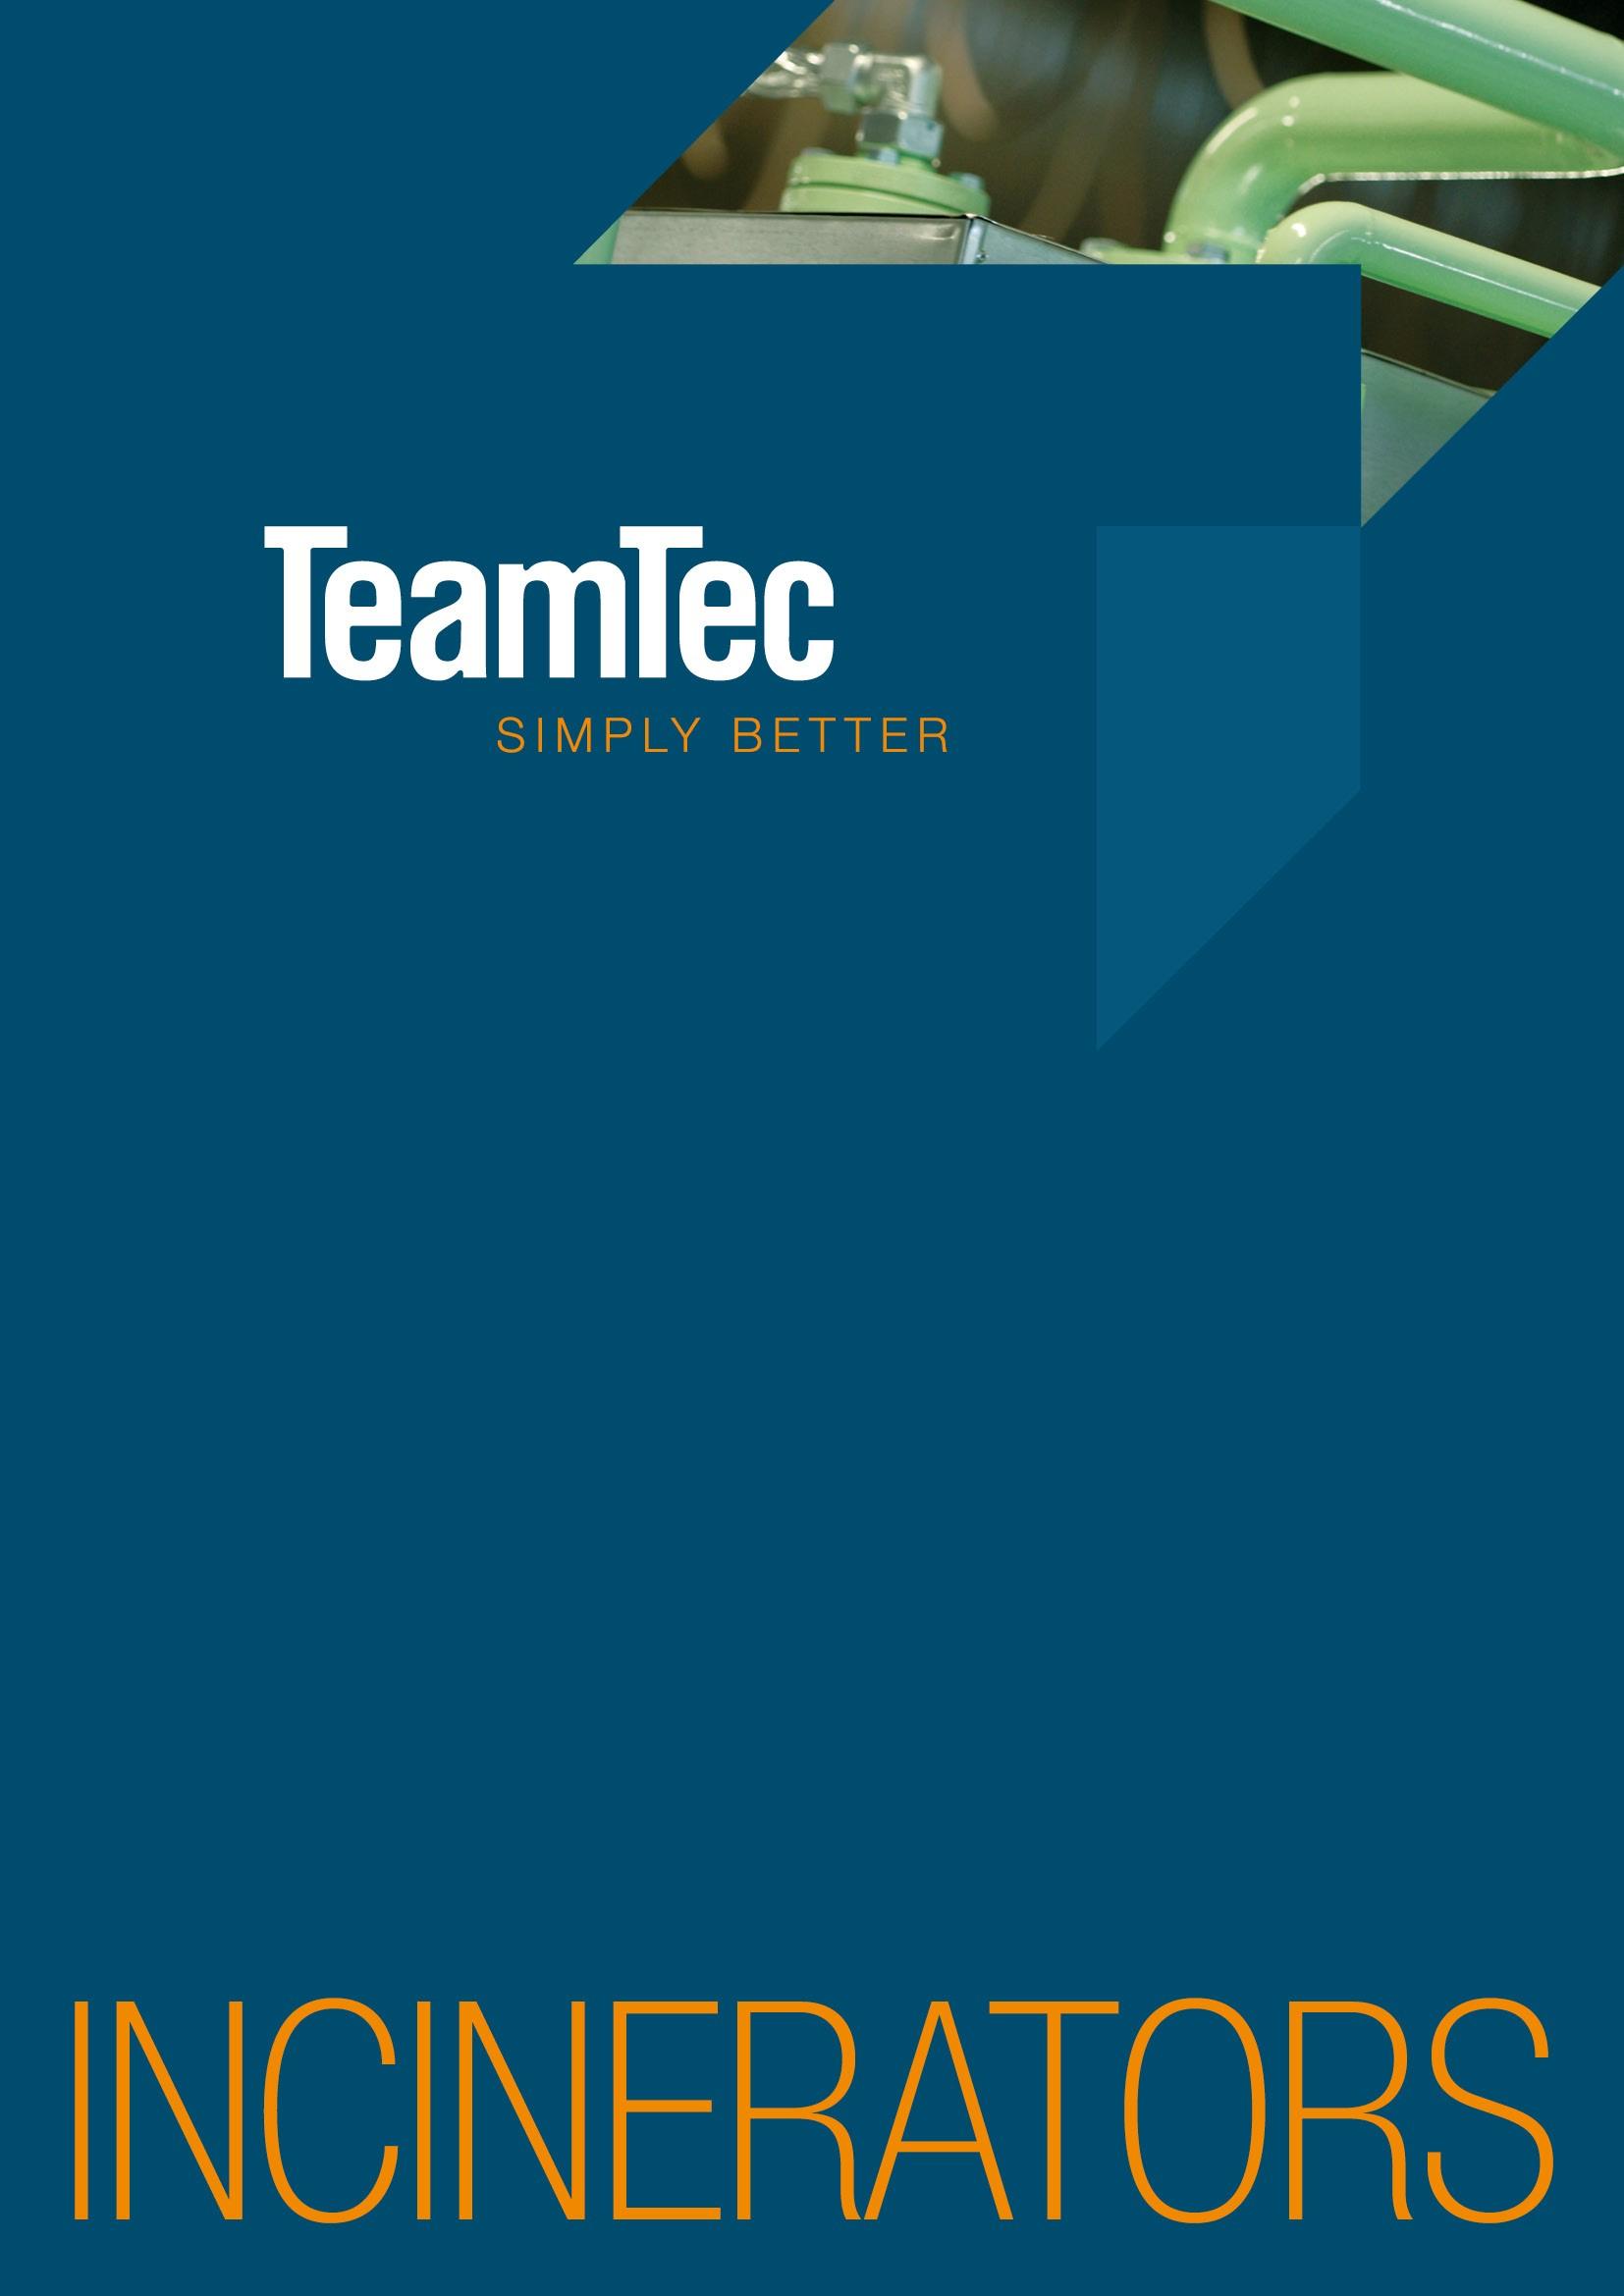 TeamTec Incinerator